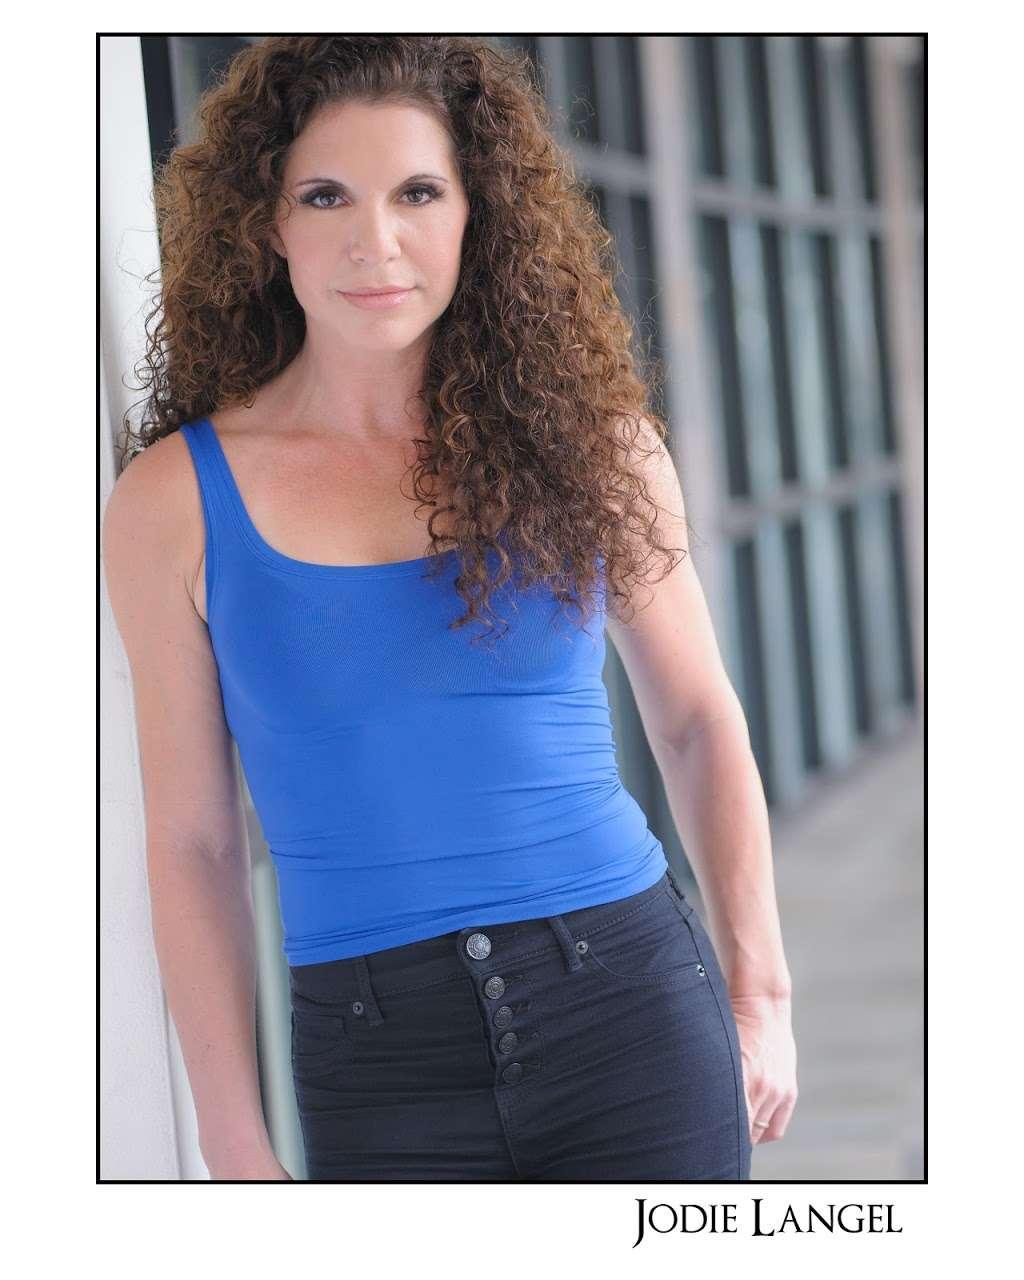 Jodie Langel Vocal & Acting Studio - school  | Photo 6 of 10 | Address: 6865 SW 18th St Suite B-13, Boca Raton, FL 33433, USA | Phone: (310) 497-5964